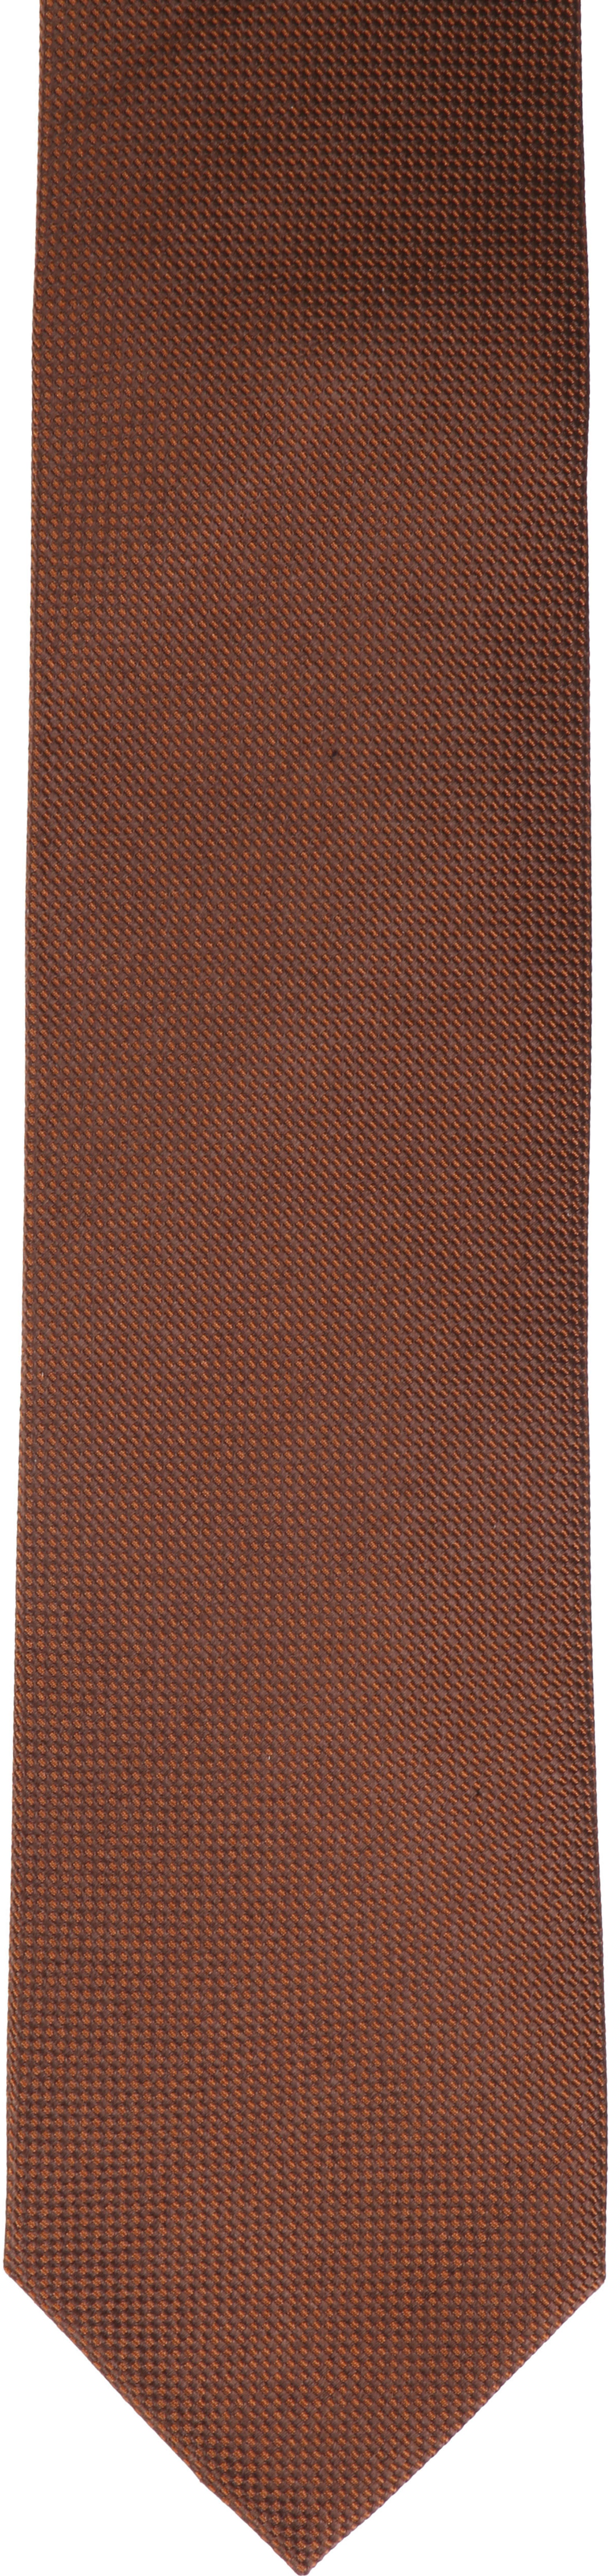 Krawatte Seide Dessin Braun foto 1